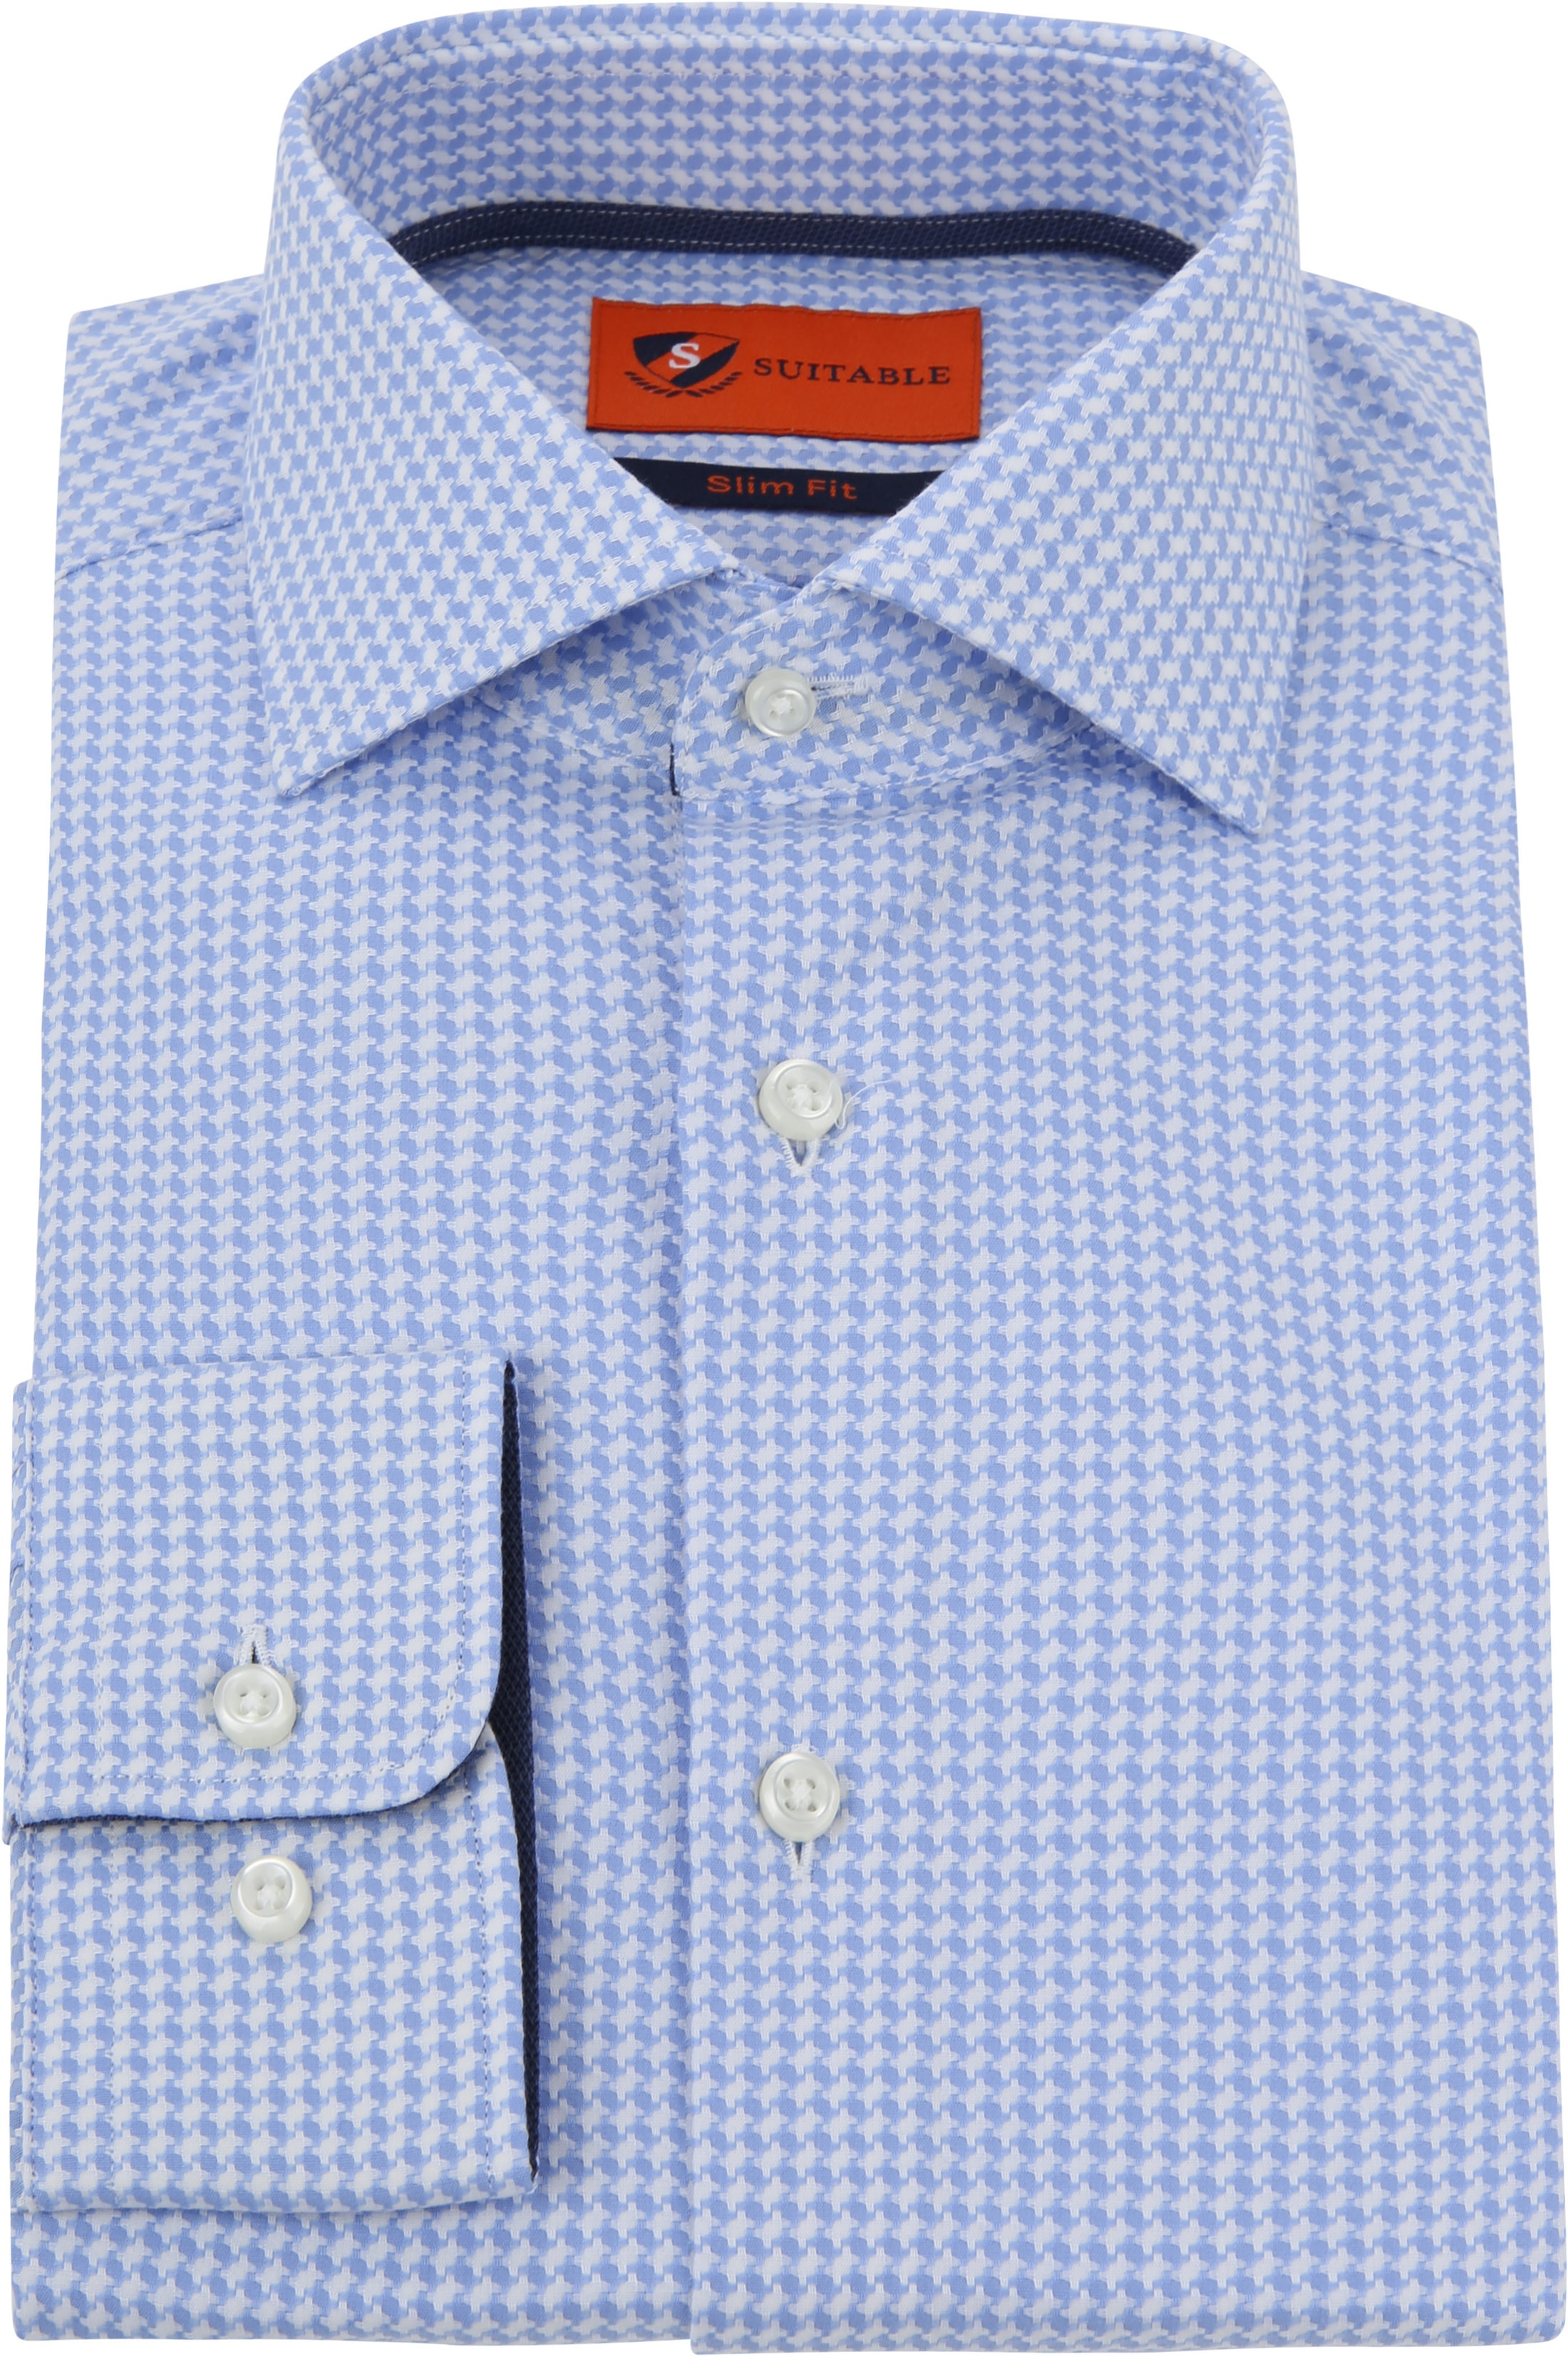 Suitable Overhemd Lichtblauw Wesley foto 2